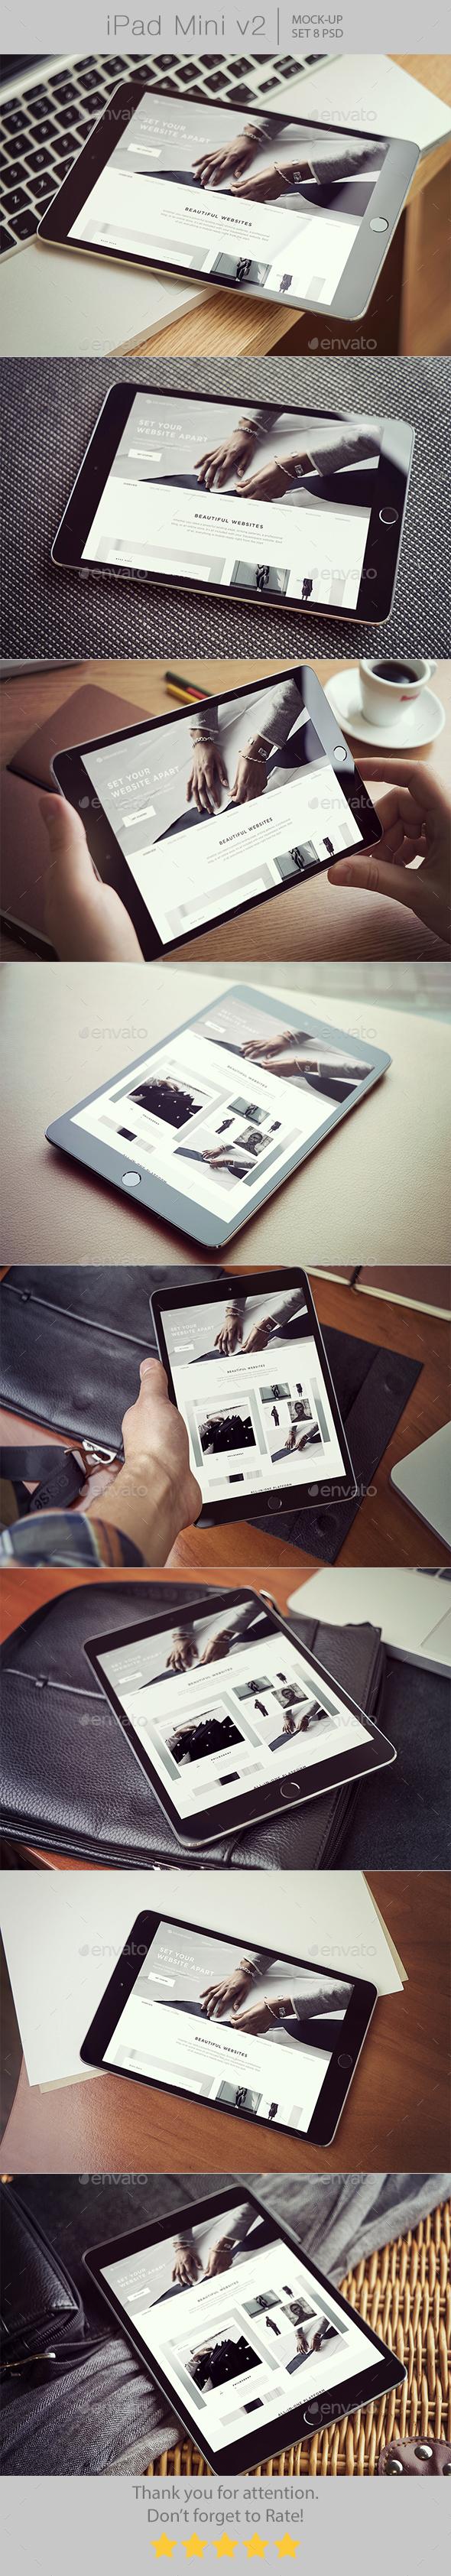 iPad Mini Mockups v2 - Displays Product Mock-Ups